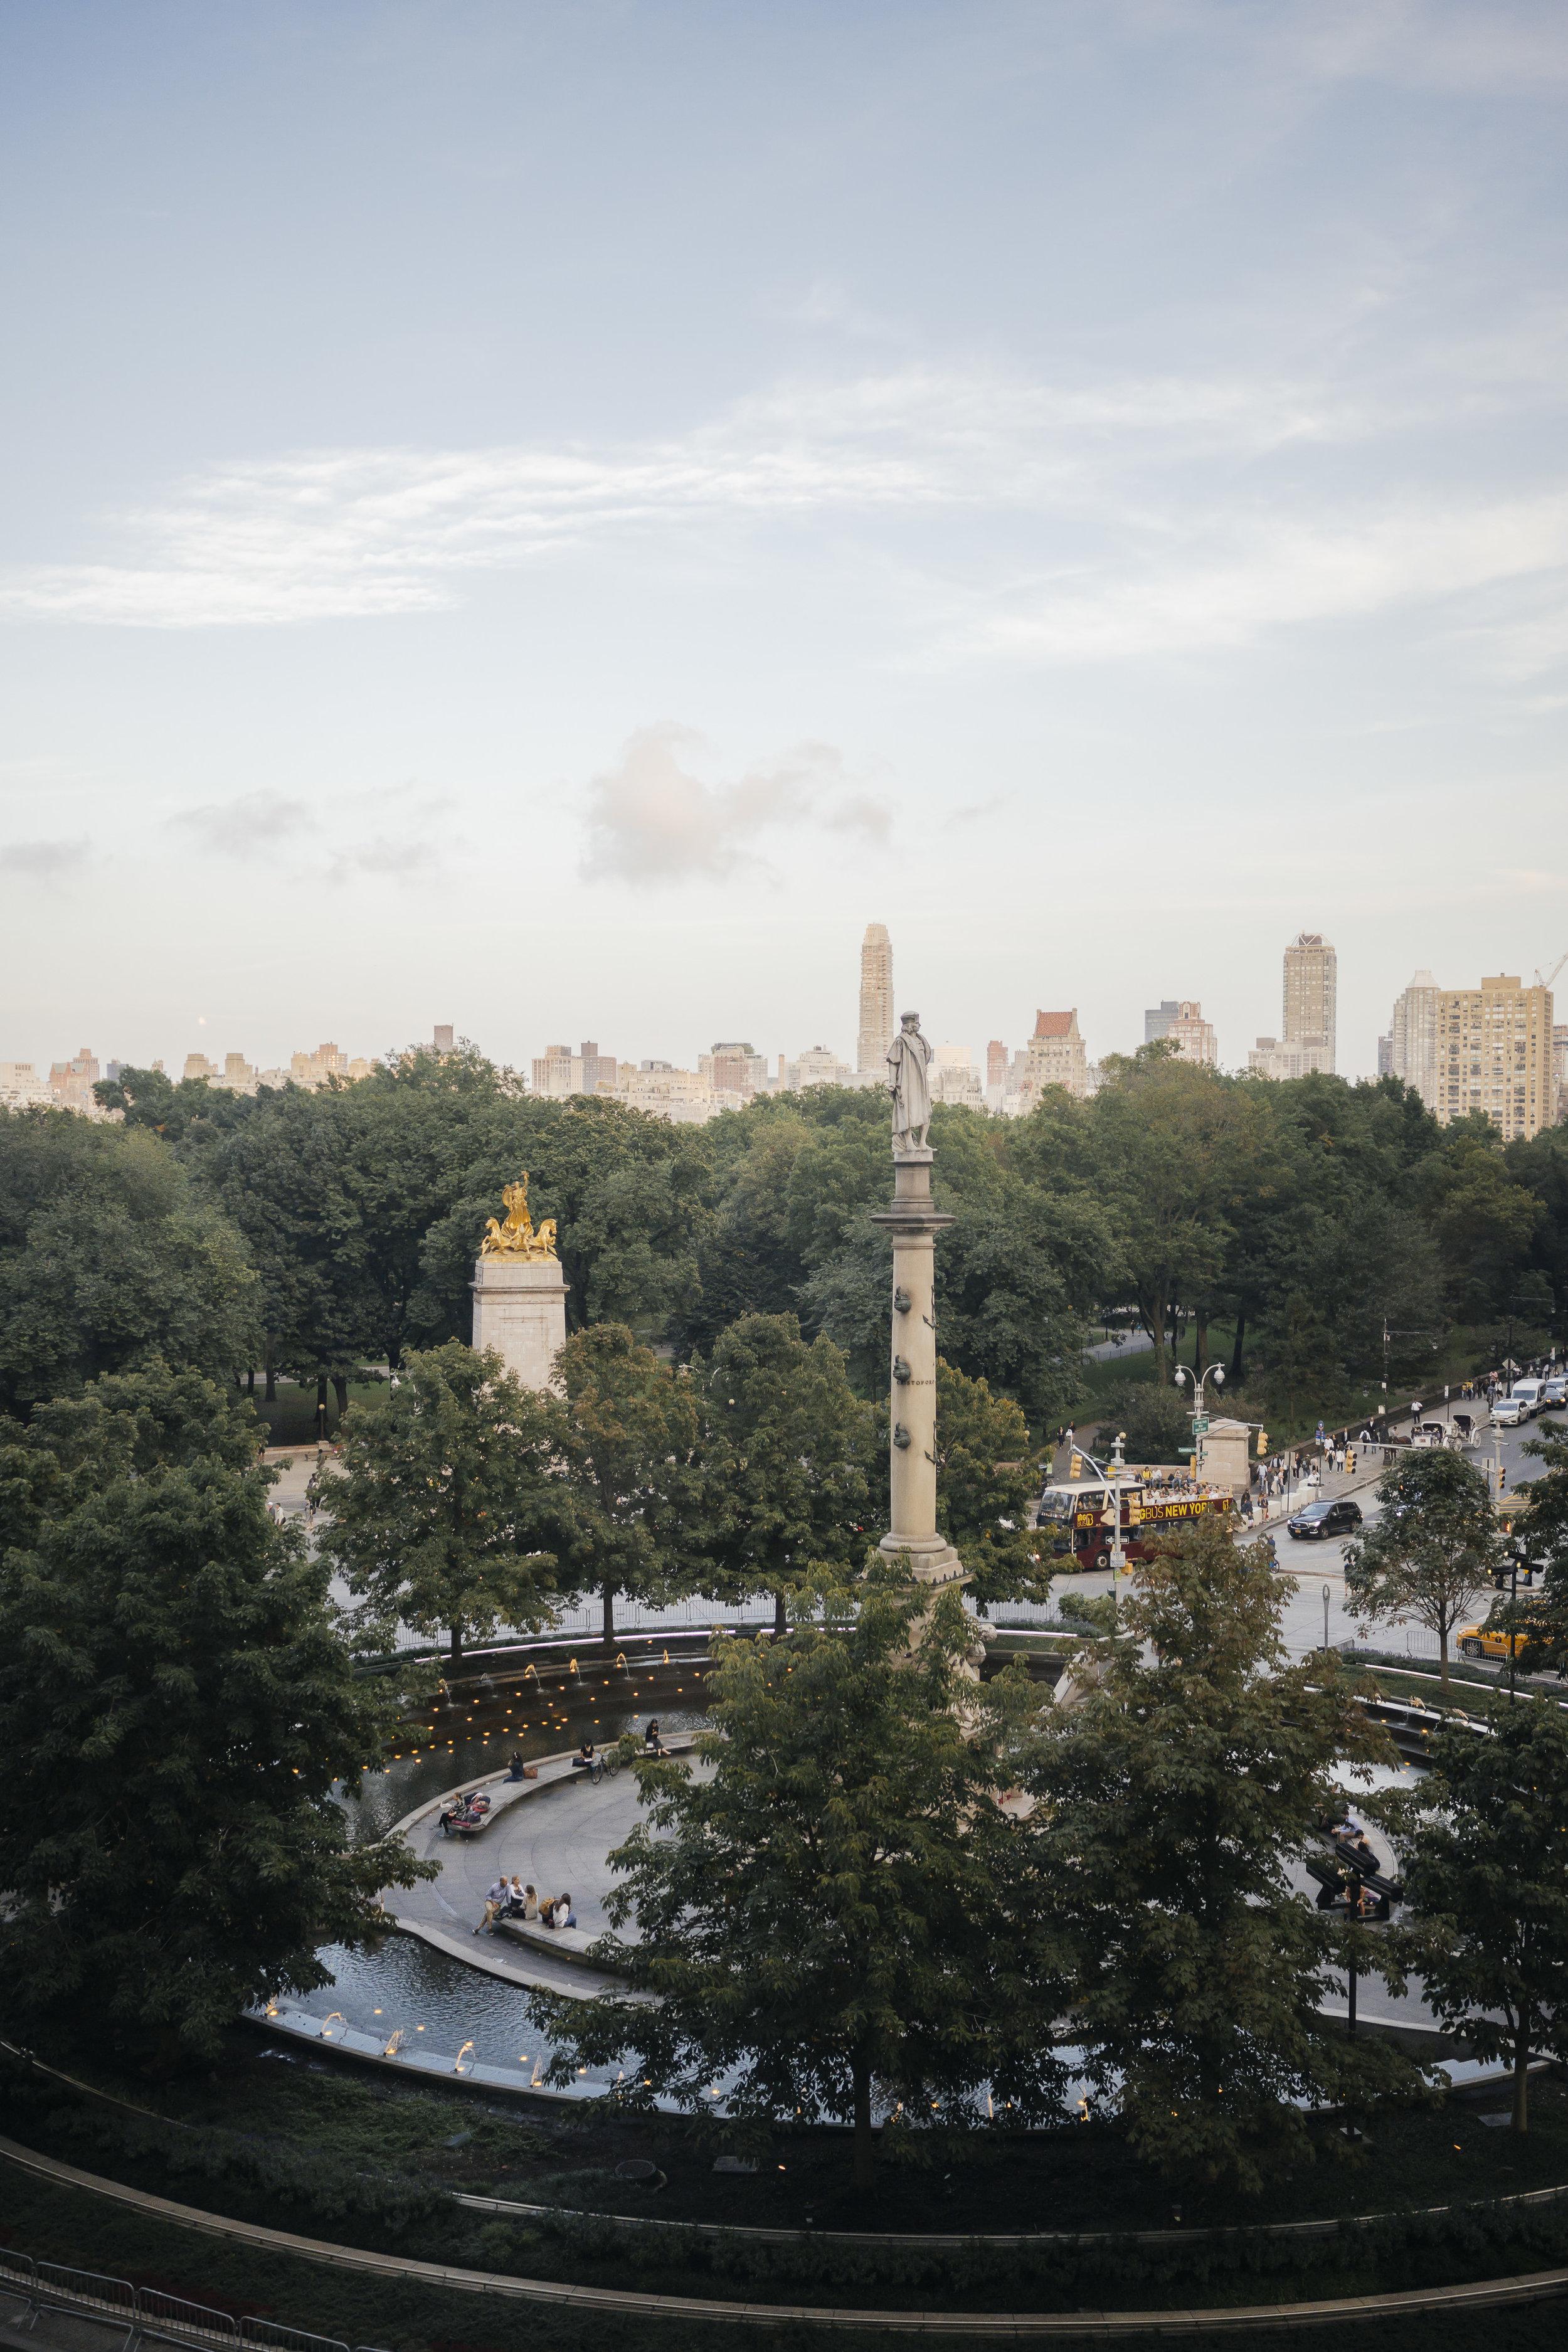 Columbus Circle, New York